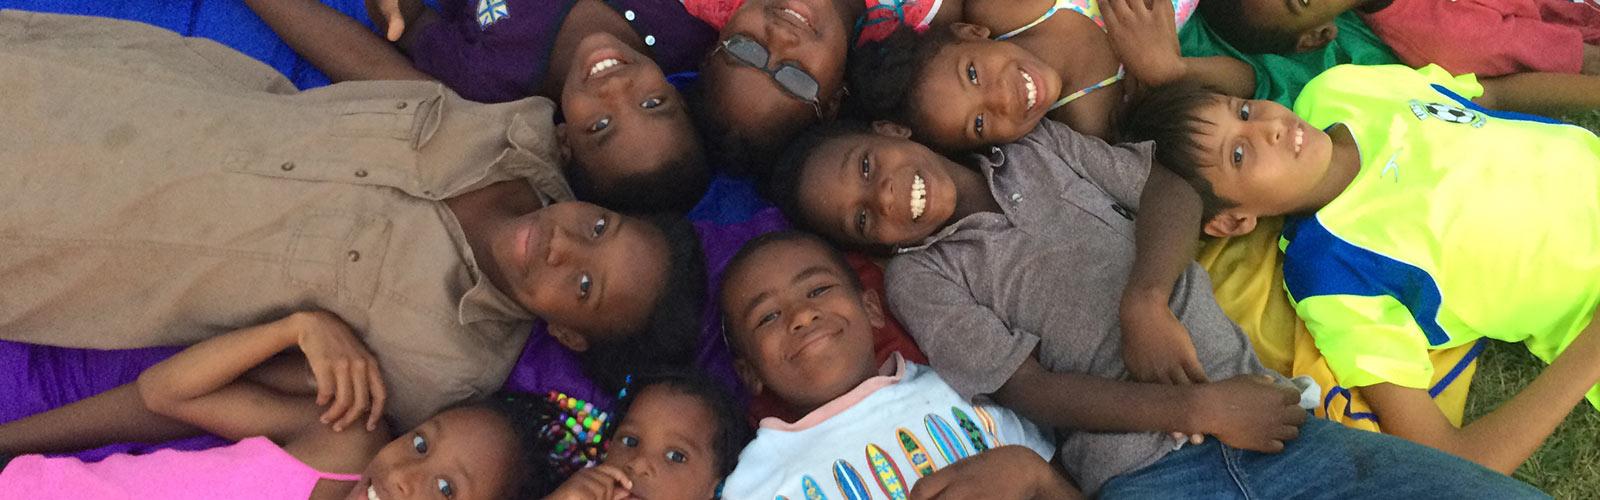 Belize Baha'i Children